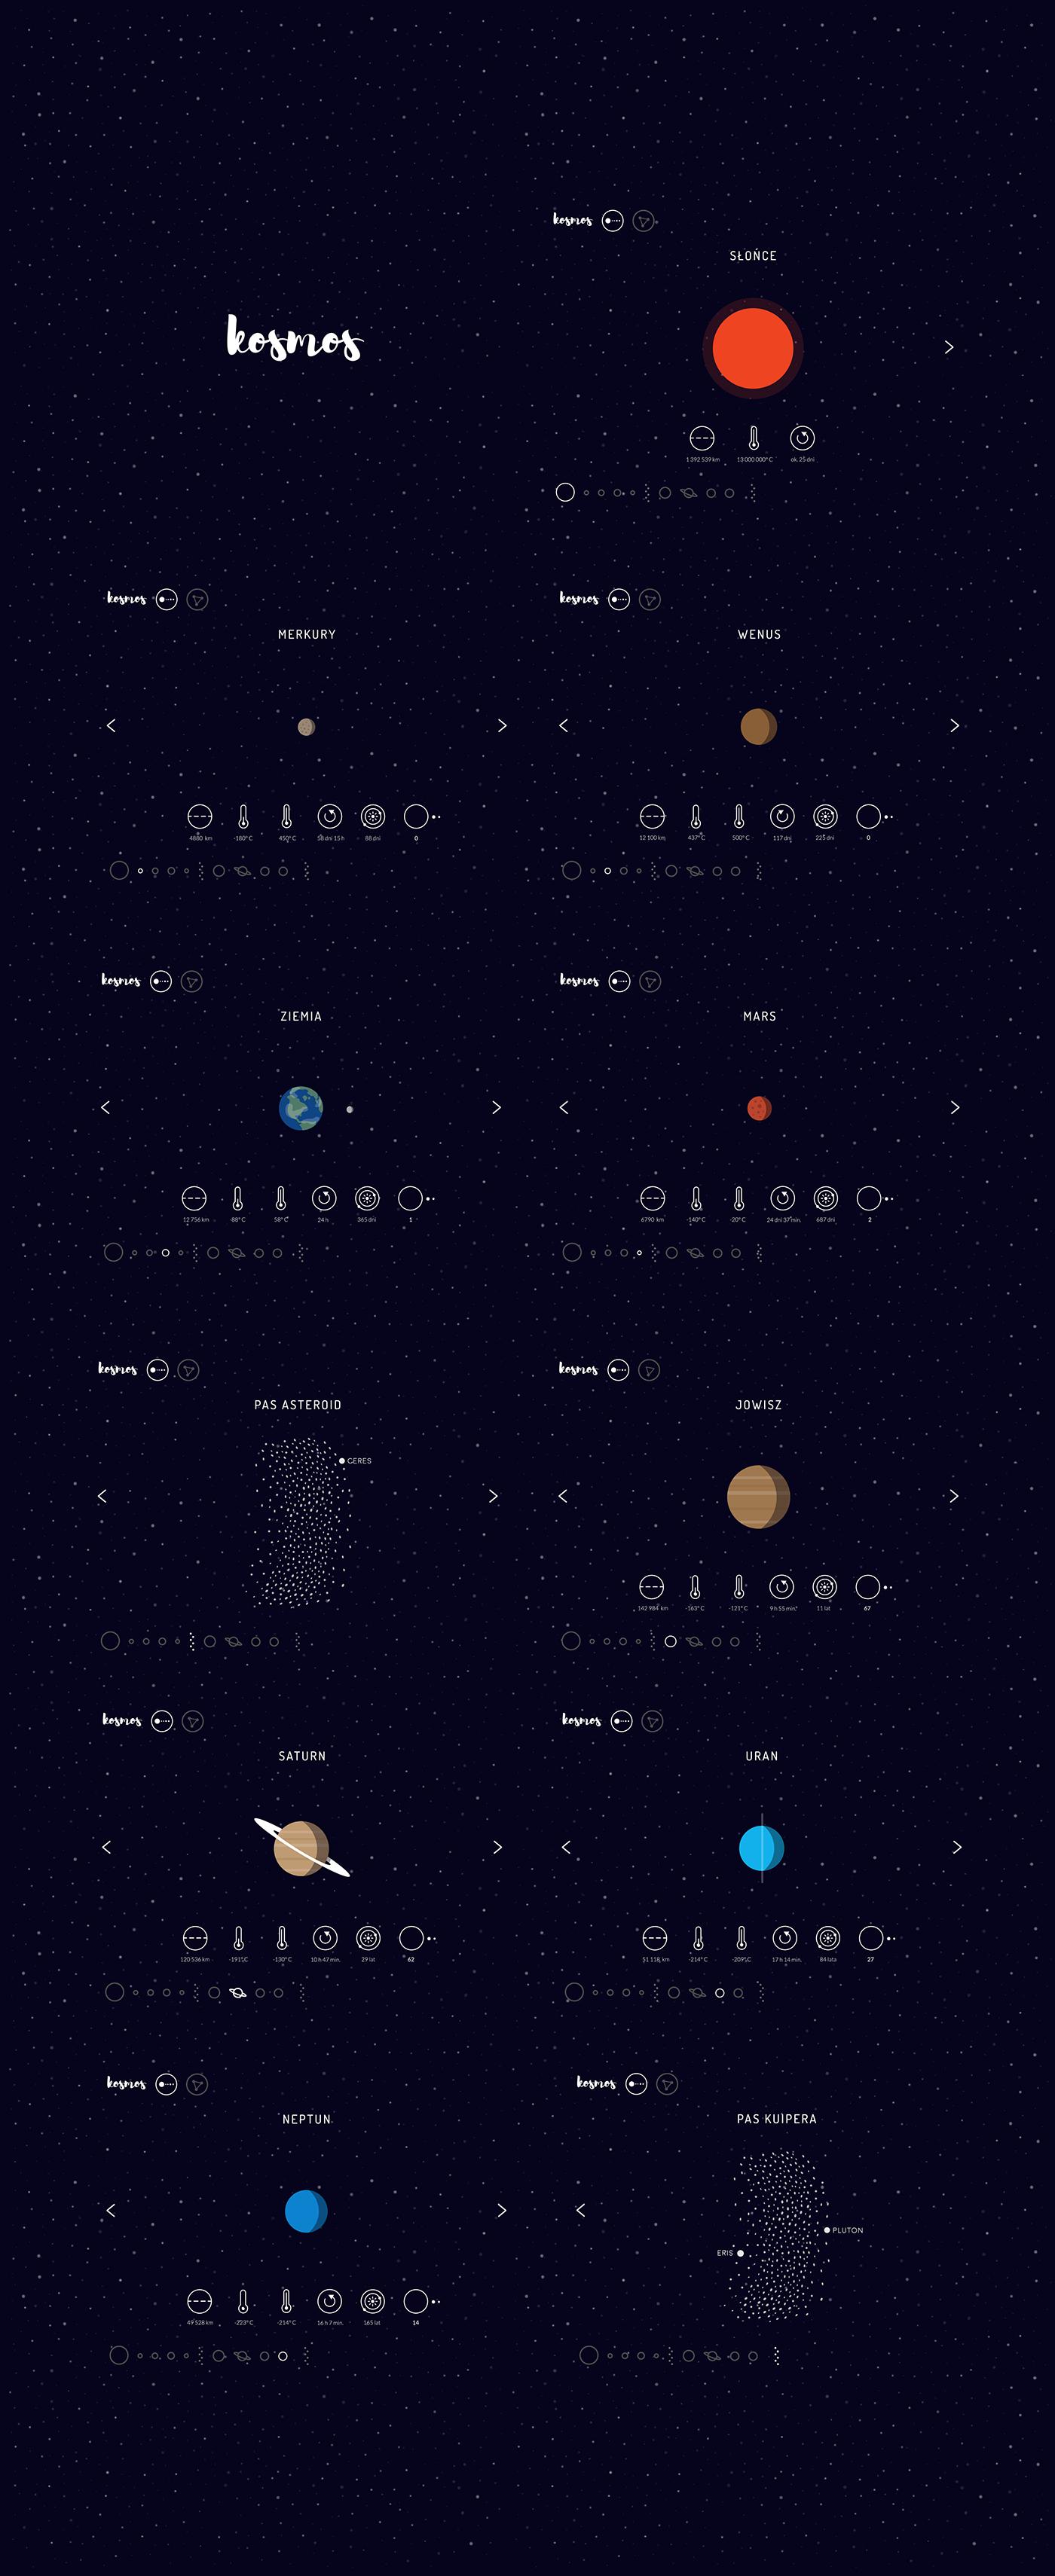 kosmos cosmos universe Space  Planets stars solar system kids